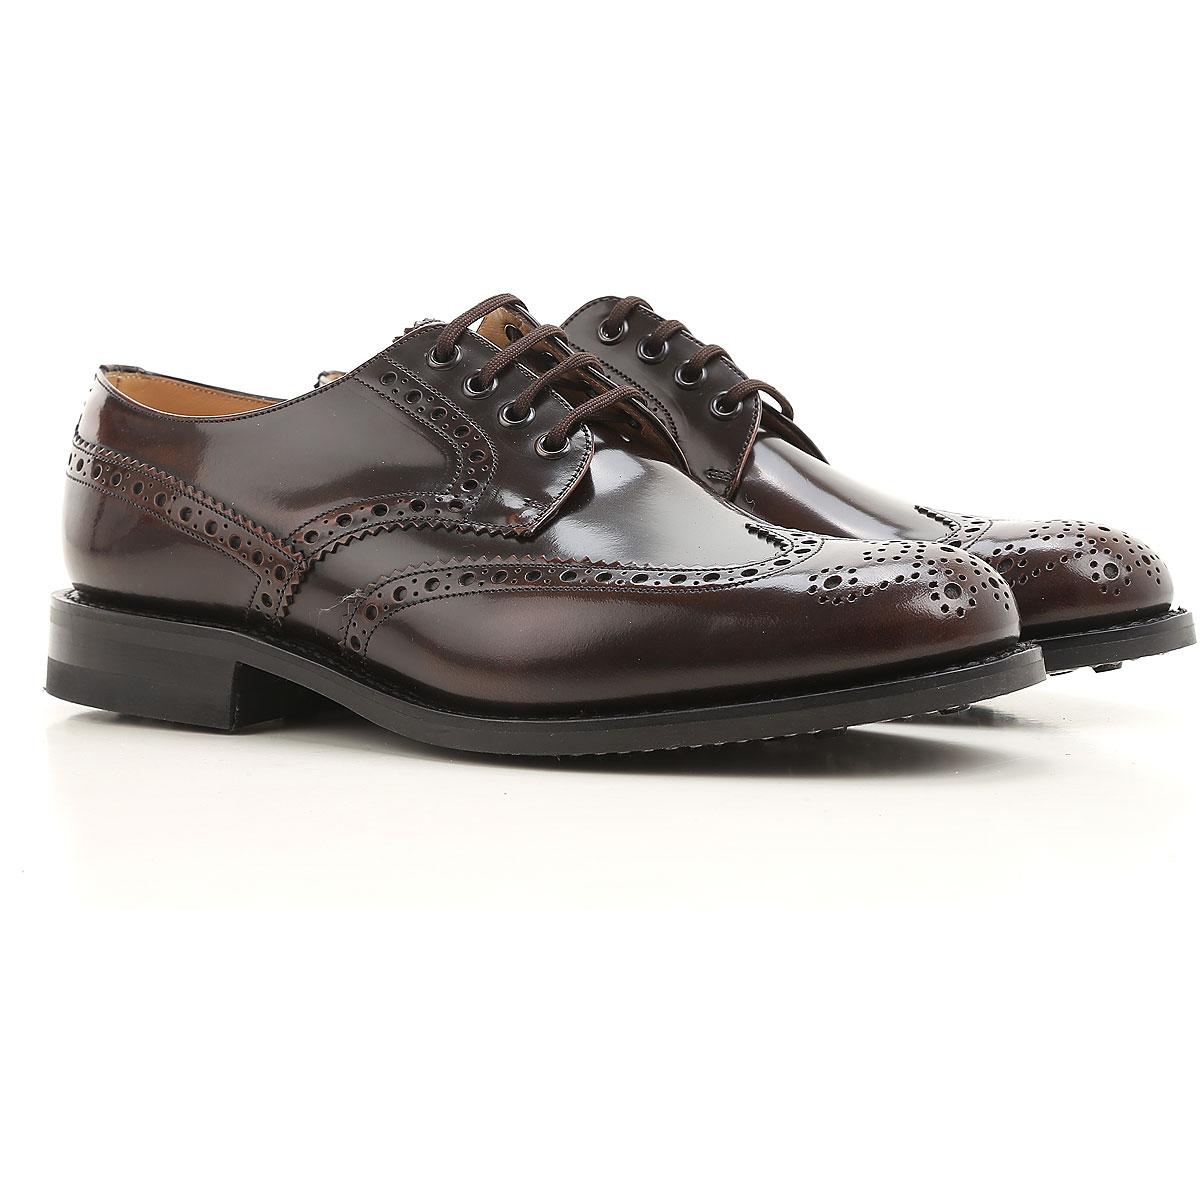 chaussures church 39 s pour homme pas cher mes chaussures. Black Bedroom Furniture Sets. Home Design Ideas